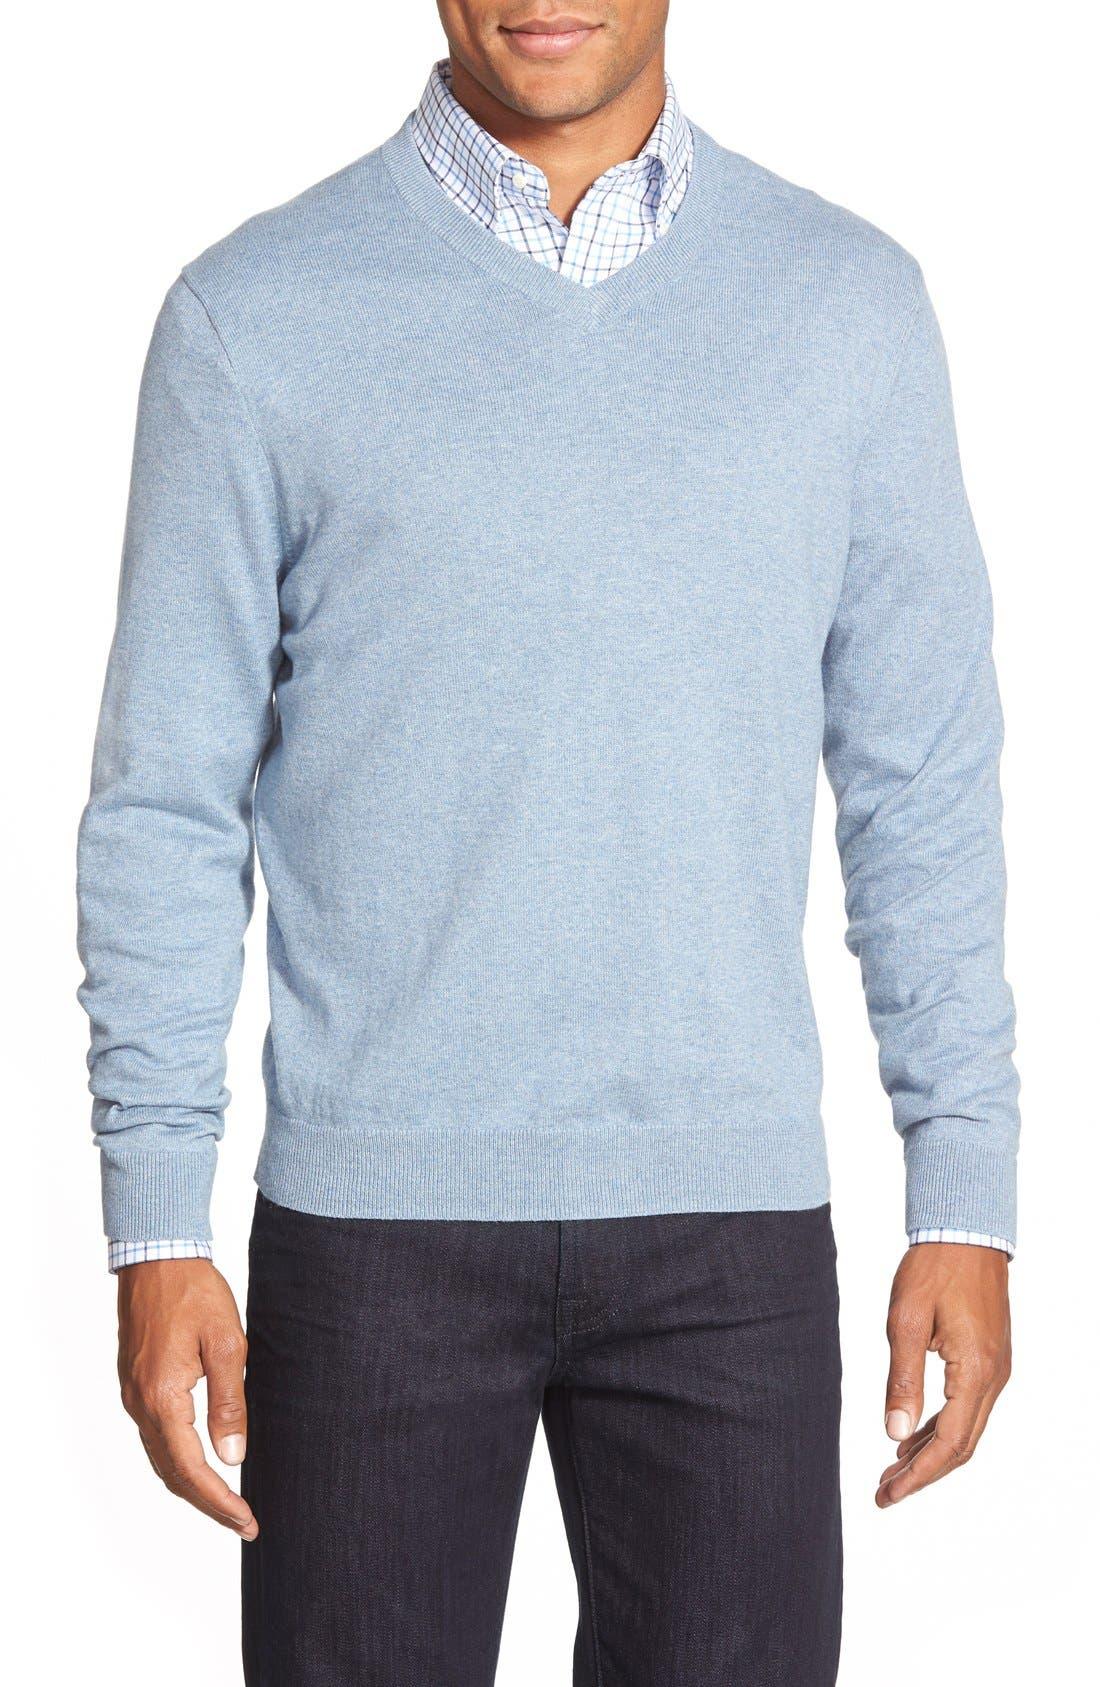 Cotton & Cashmere V-Neck Sweater,                             Main thumbnail 1, color,                             Blue Celestial Heather